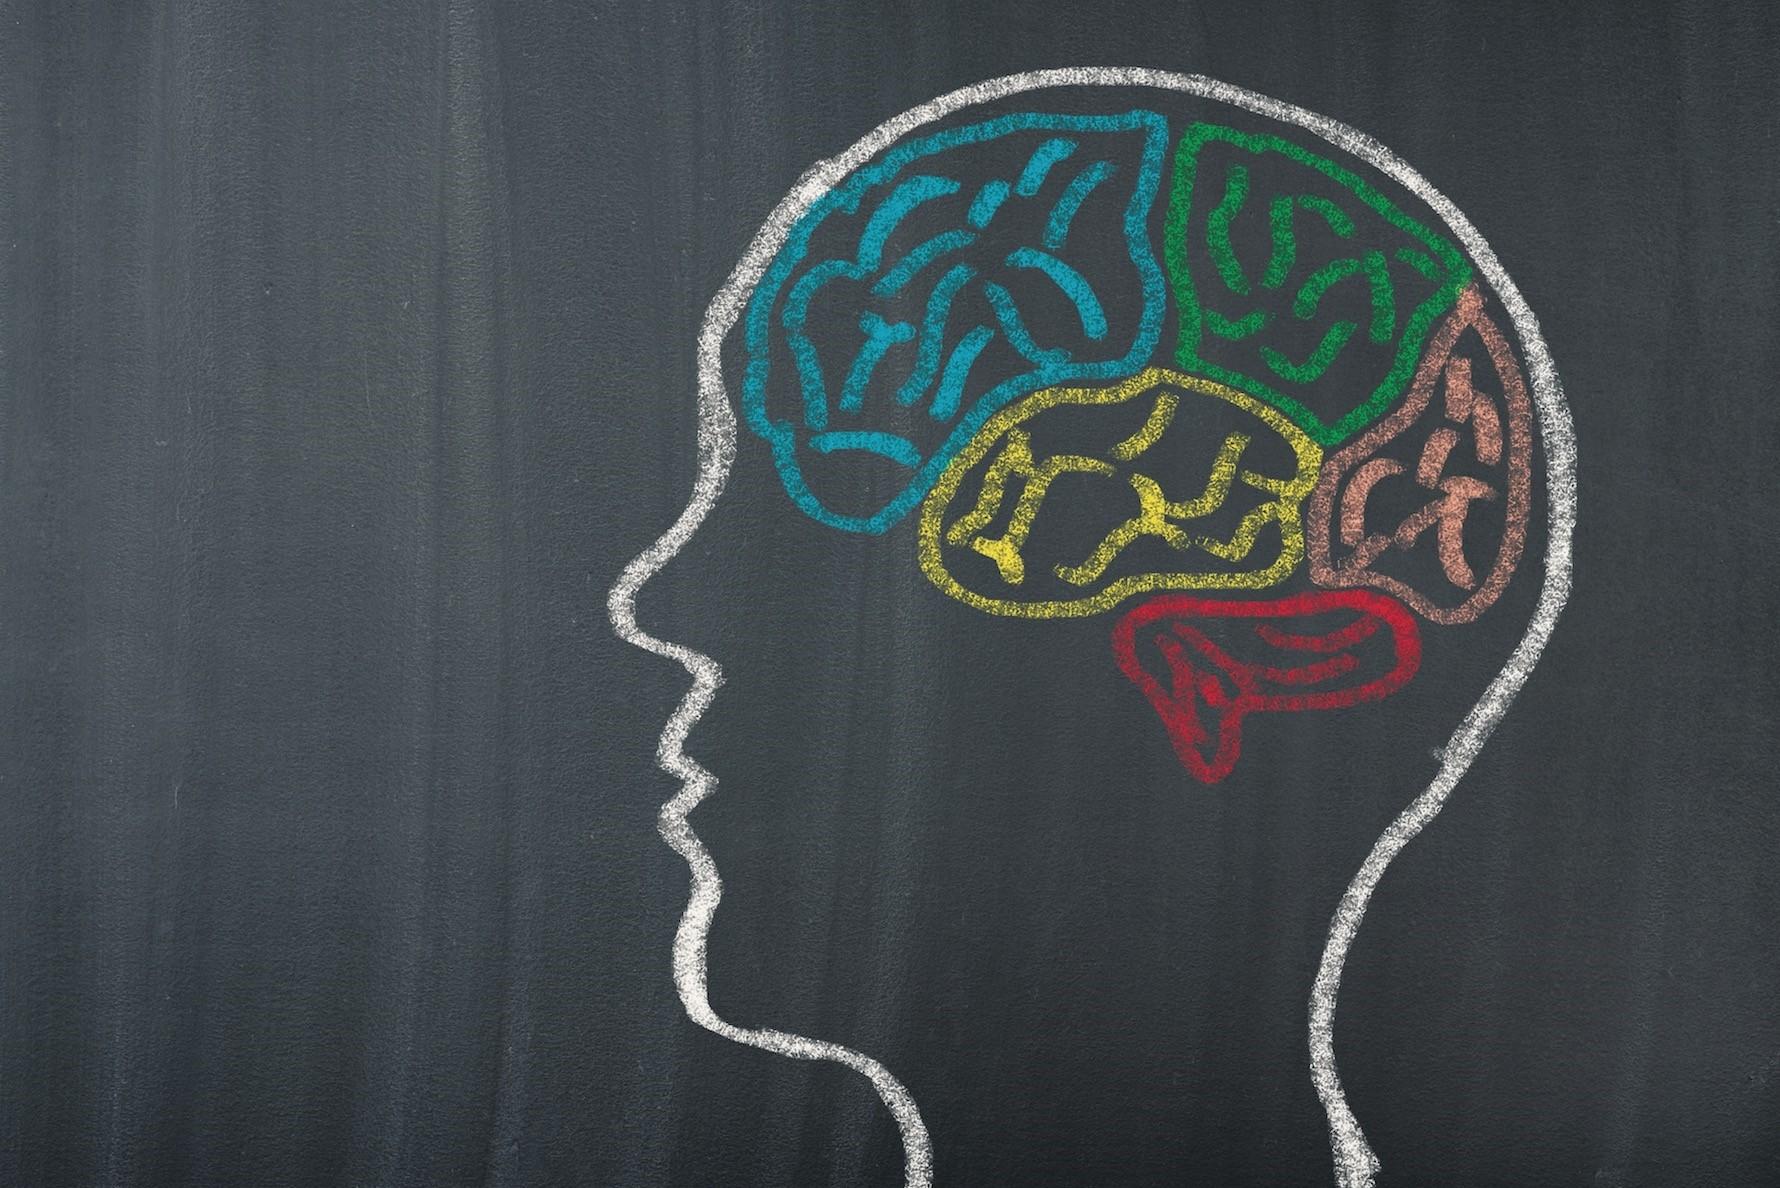 Dramatic drop in peopleu2019s IQ levels since 1975, study reveals